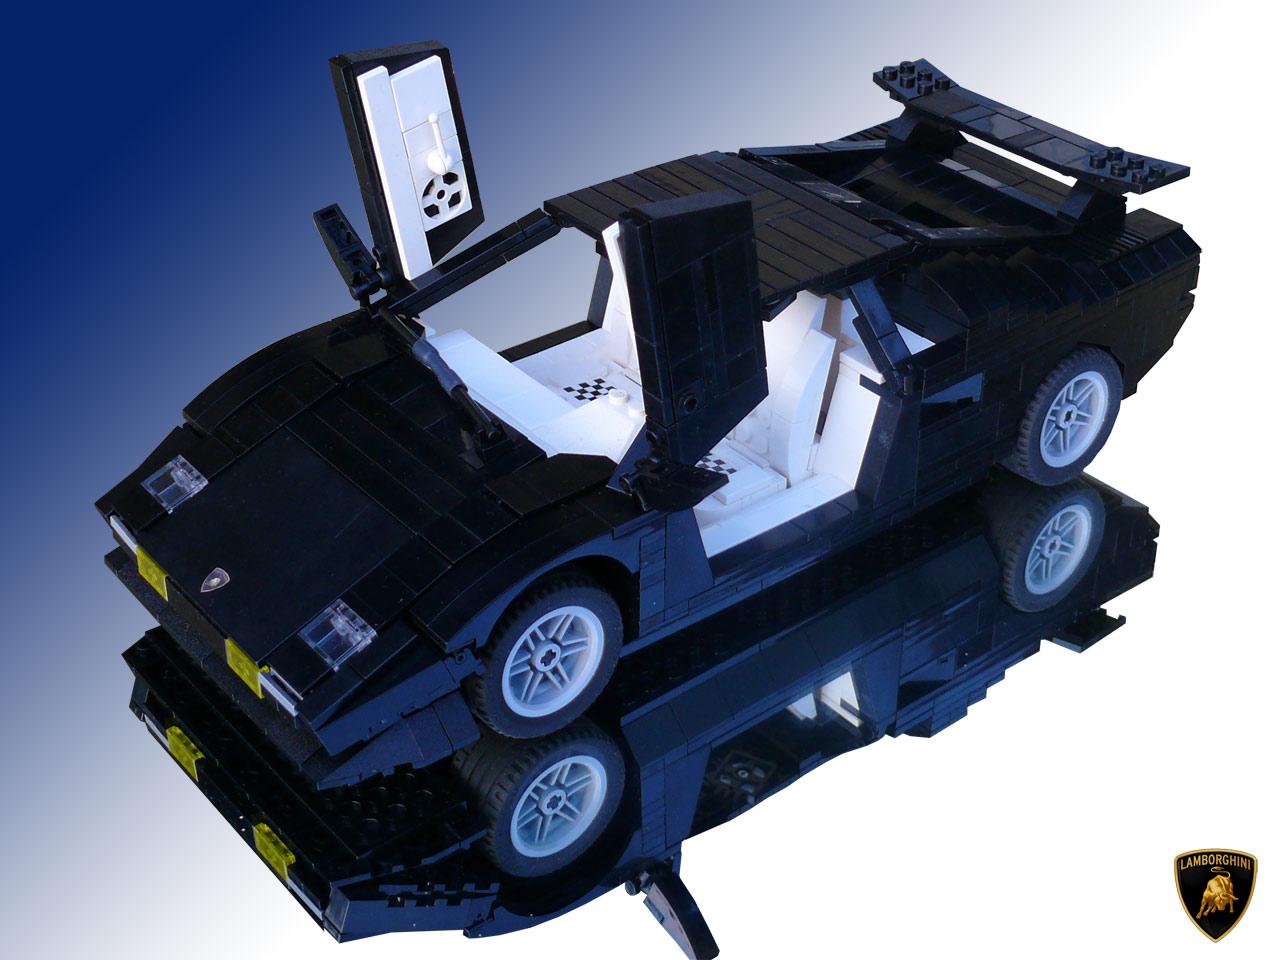 LEGO Lamborghini Countach model